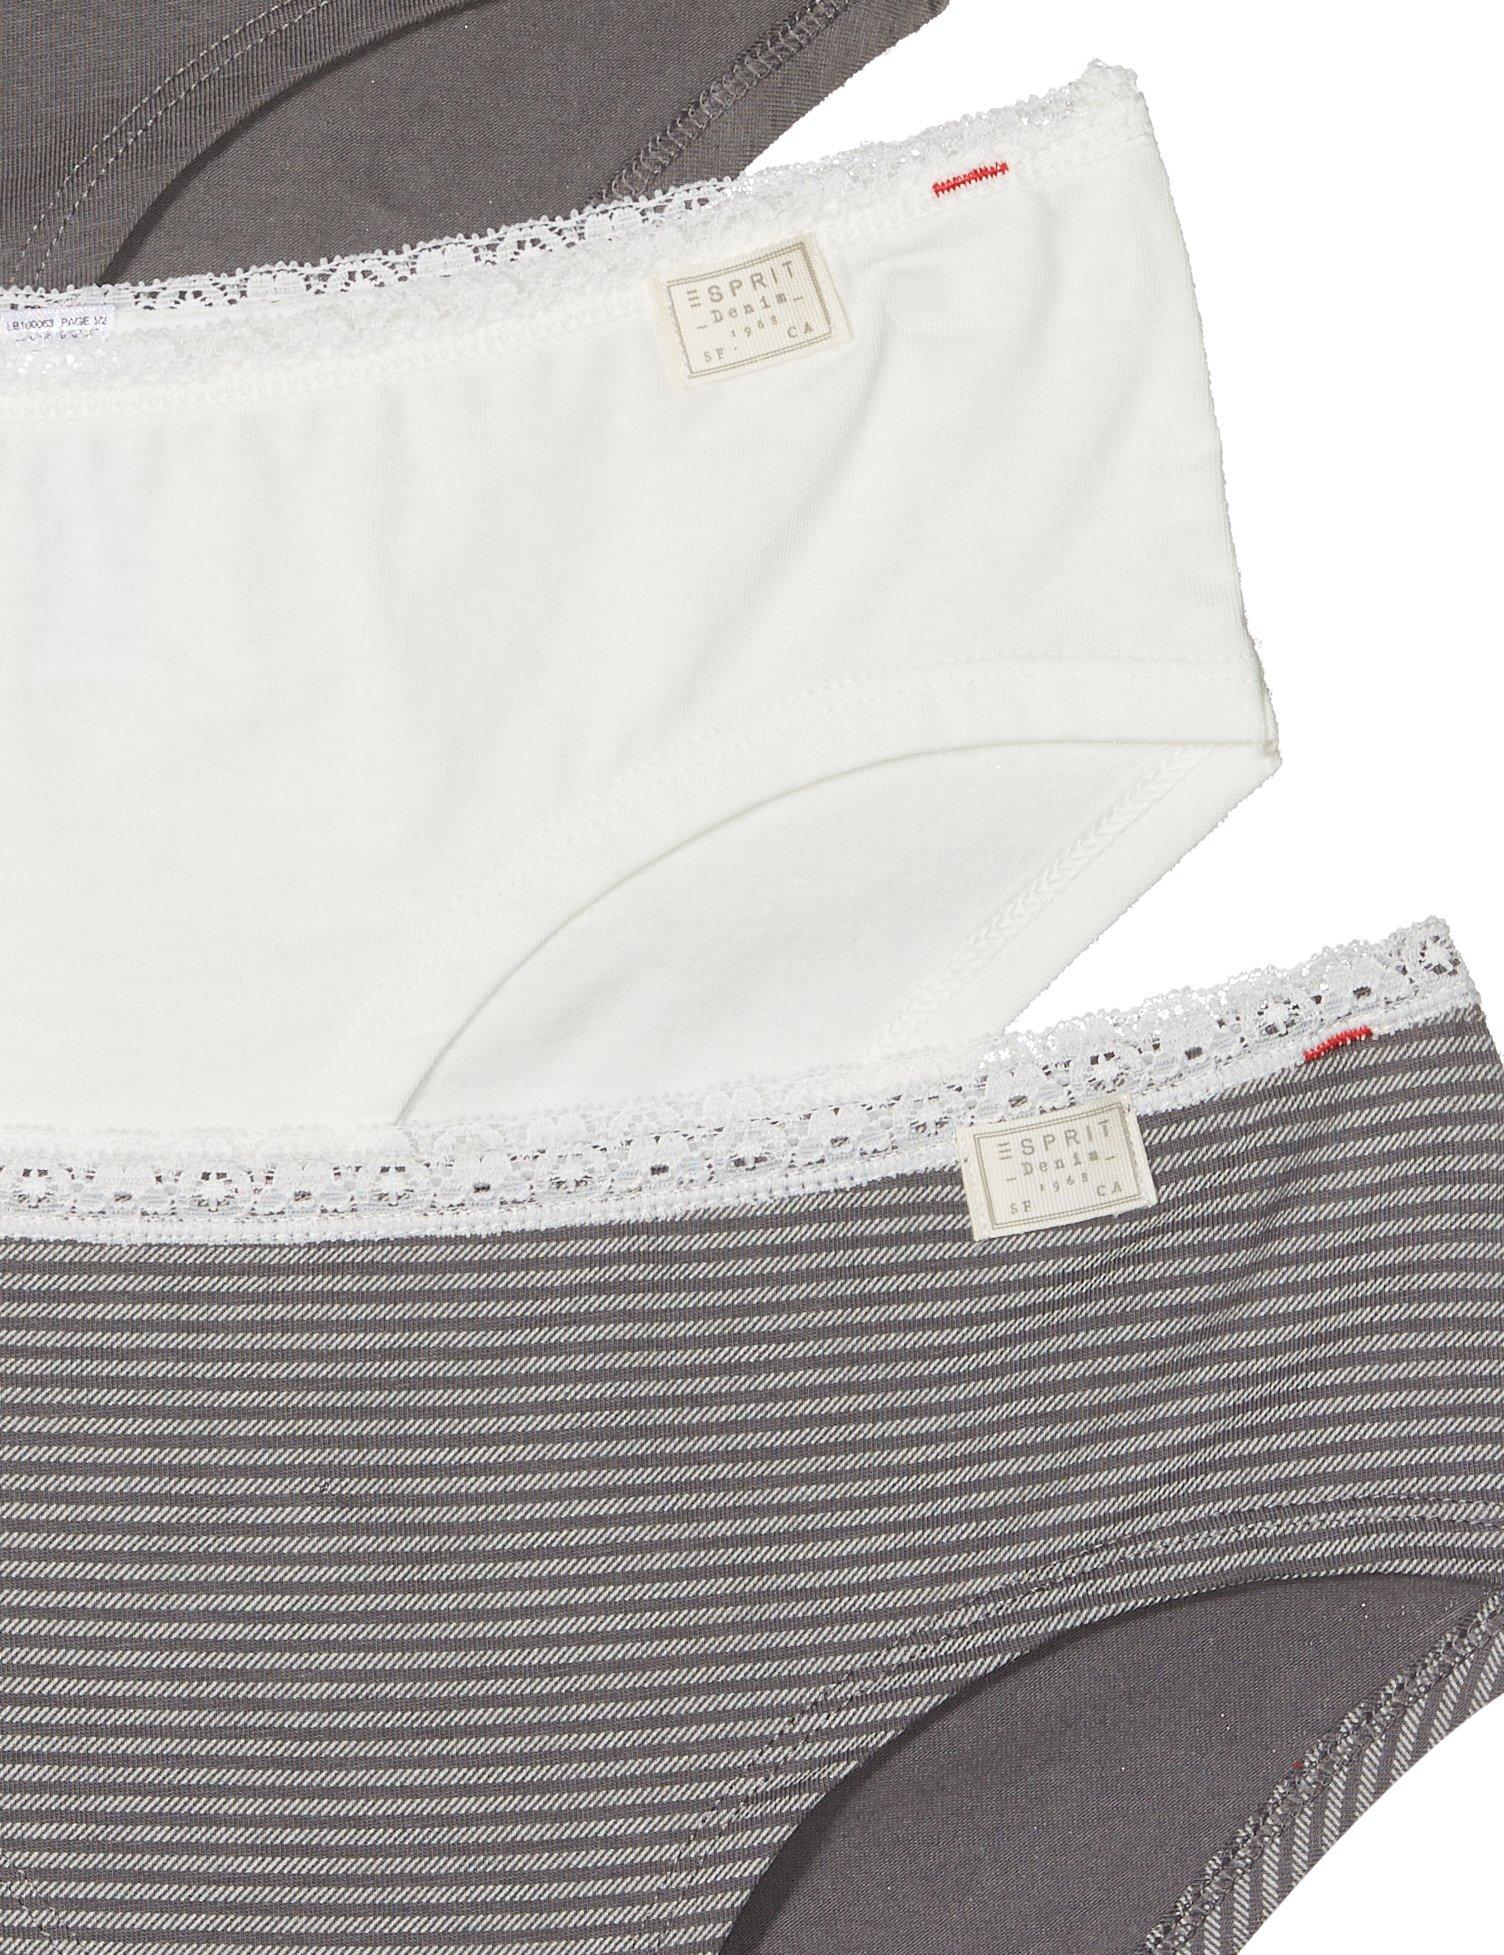 Esprit Culotte para Mujer (Pack de 3)